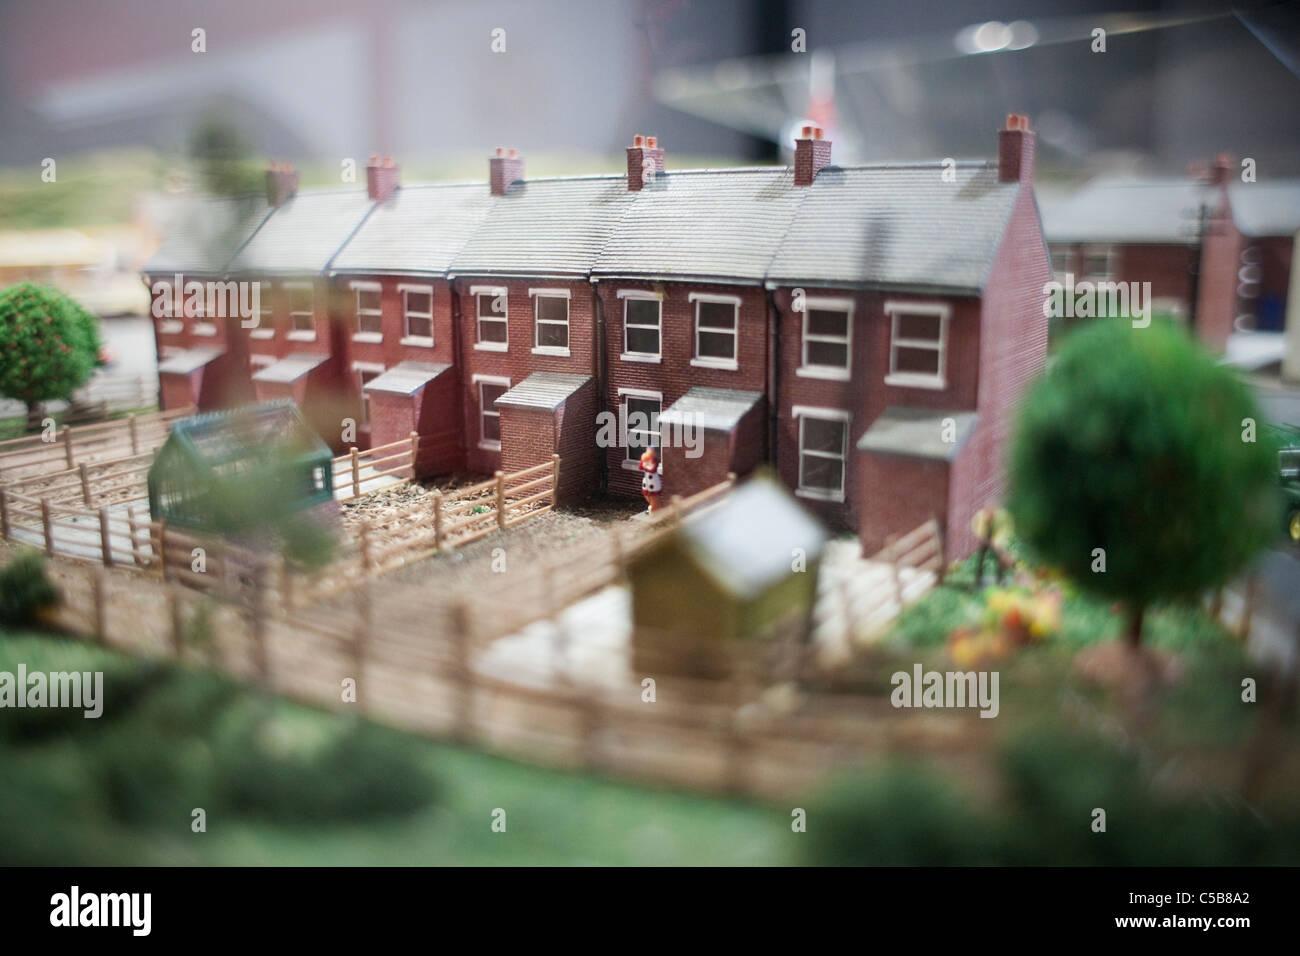 Häuserzeile Modell Stockbild